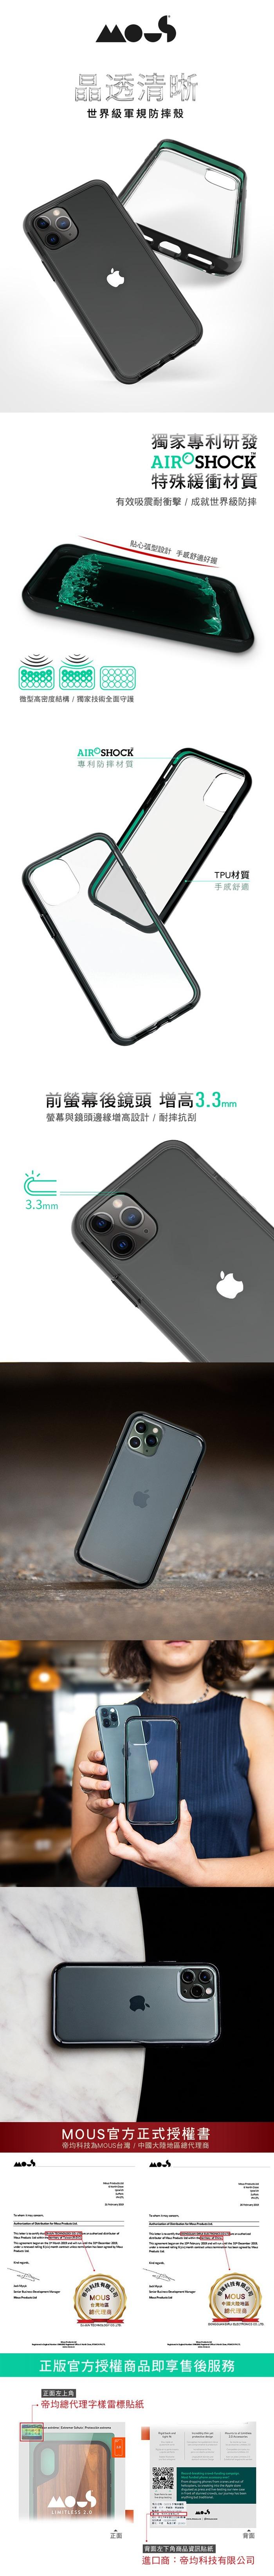 Mous|iPhone Clarity 透明軍規防摔保護殼(iPhone 11 Pro /iPhone 11 /iPhone 11 Pro Max)